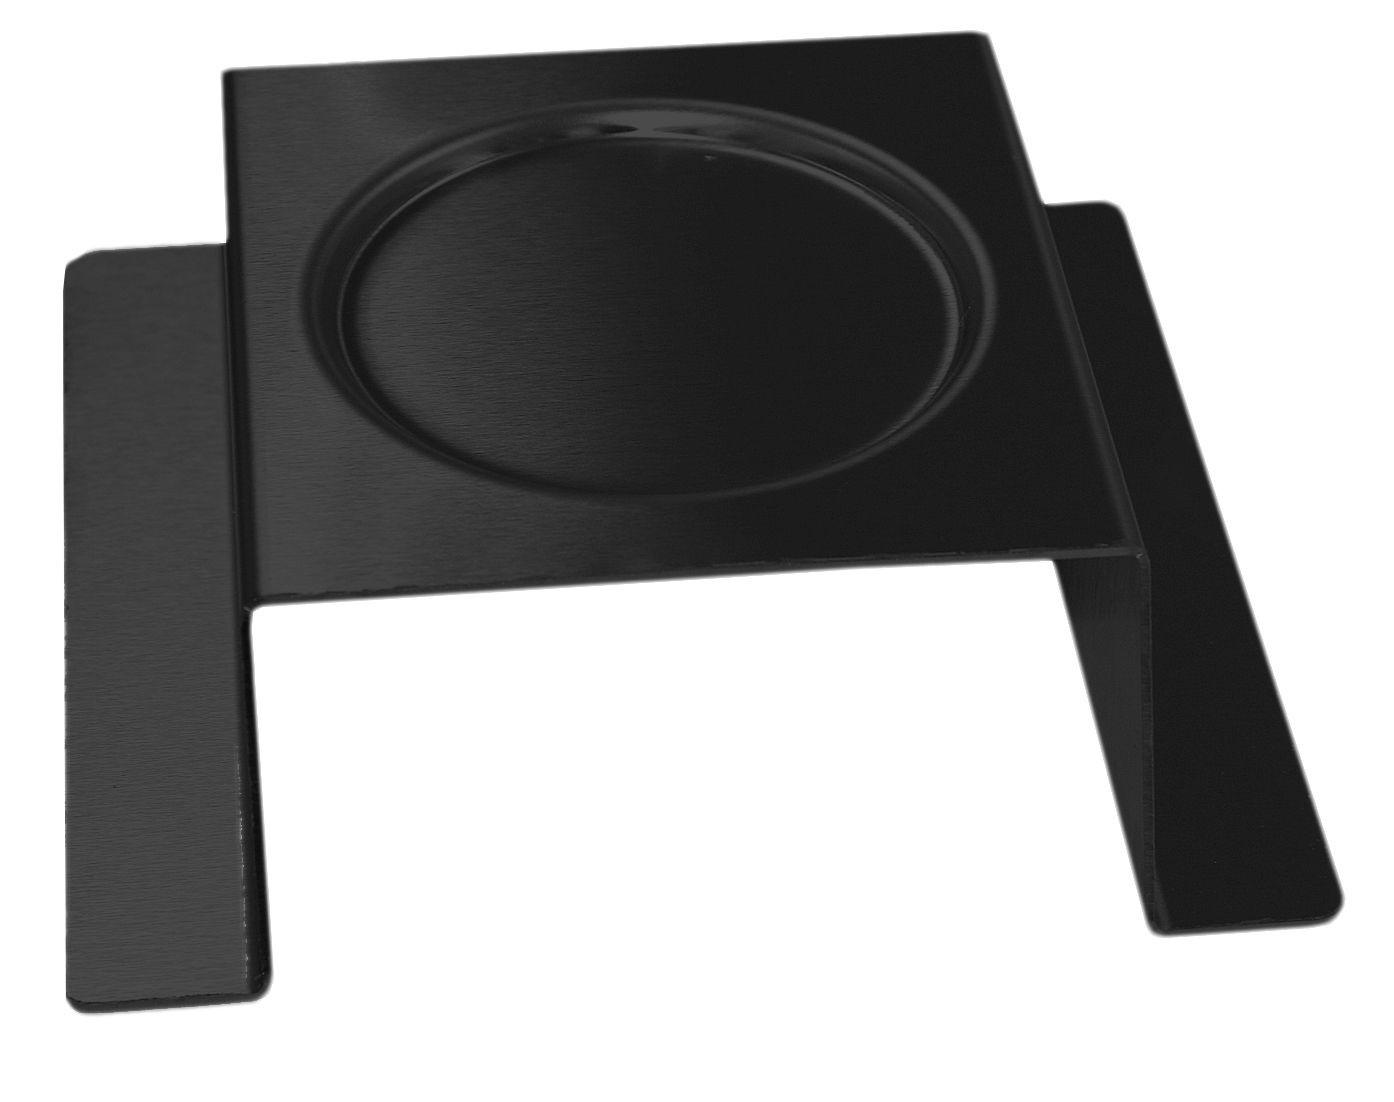 "Rosseto SM170 Square Black Matte Steel Burner Stand 7"" x 7"" x 2"""